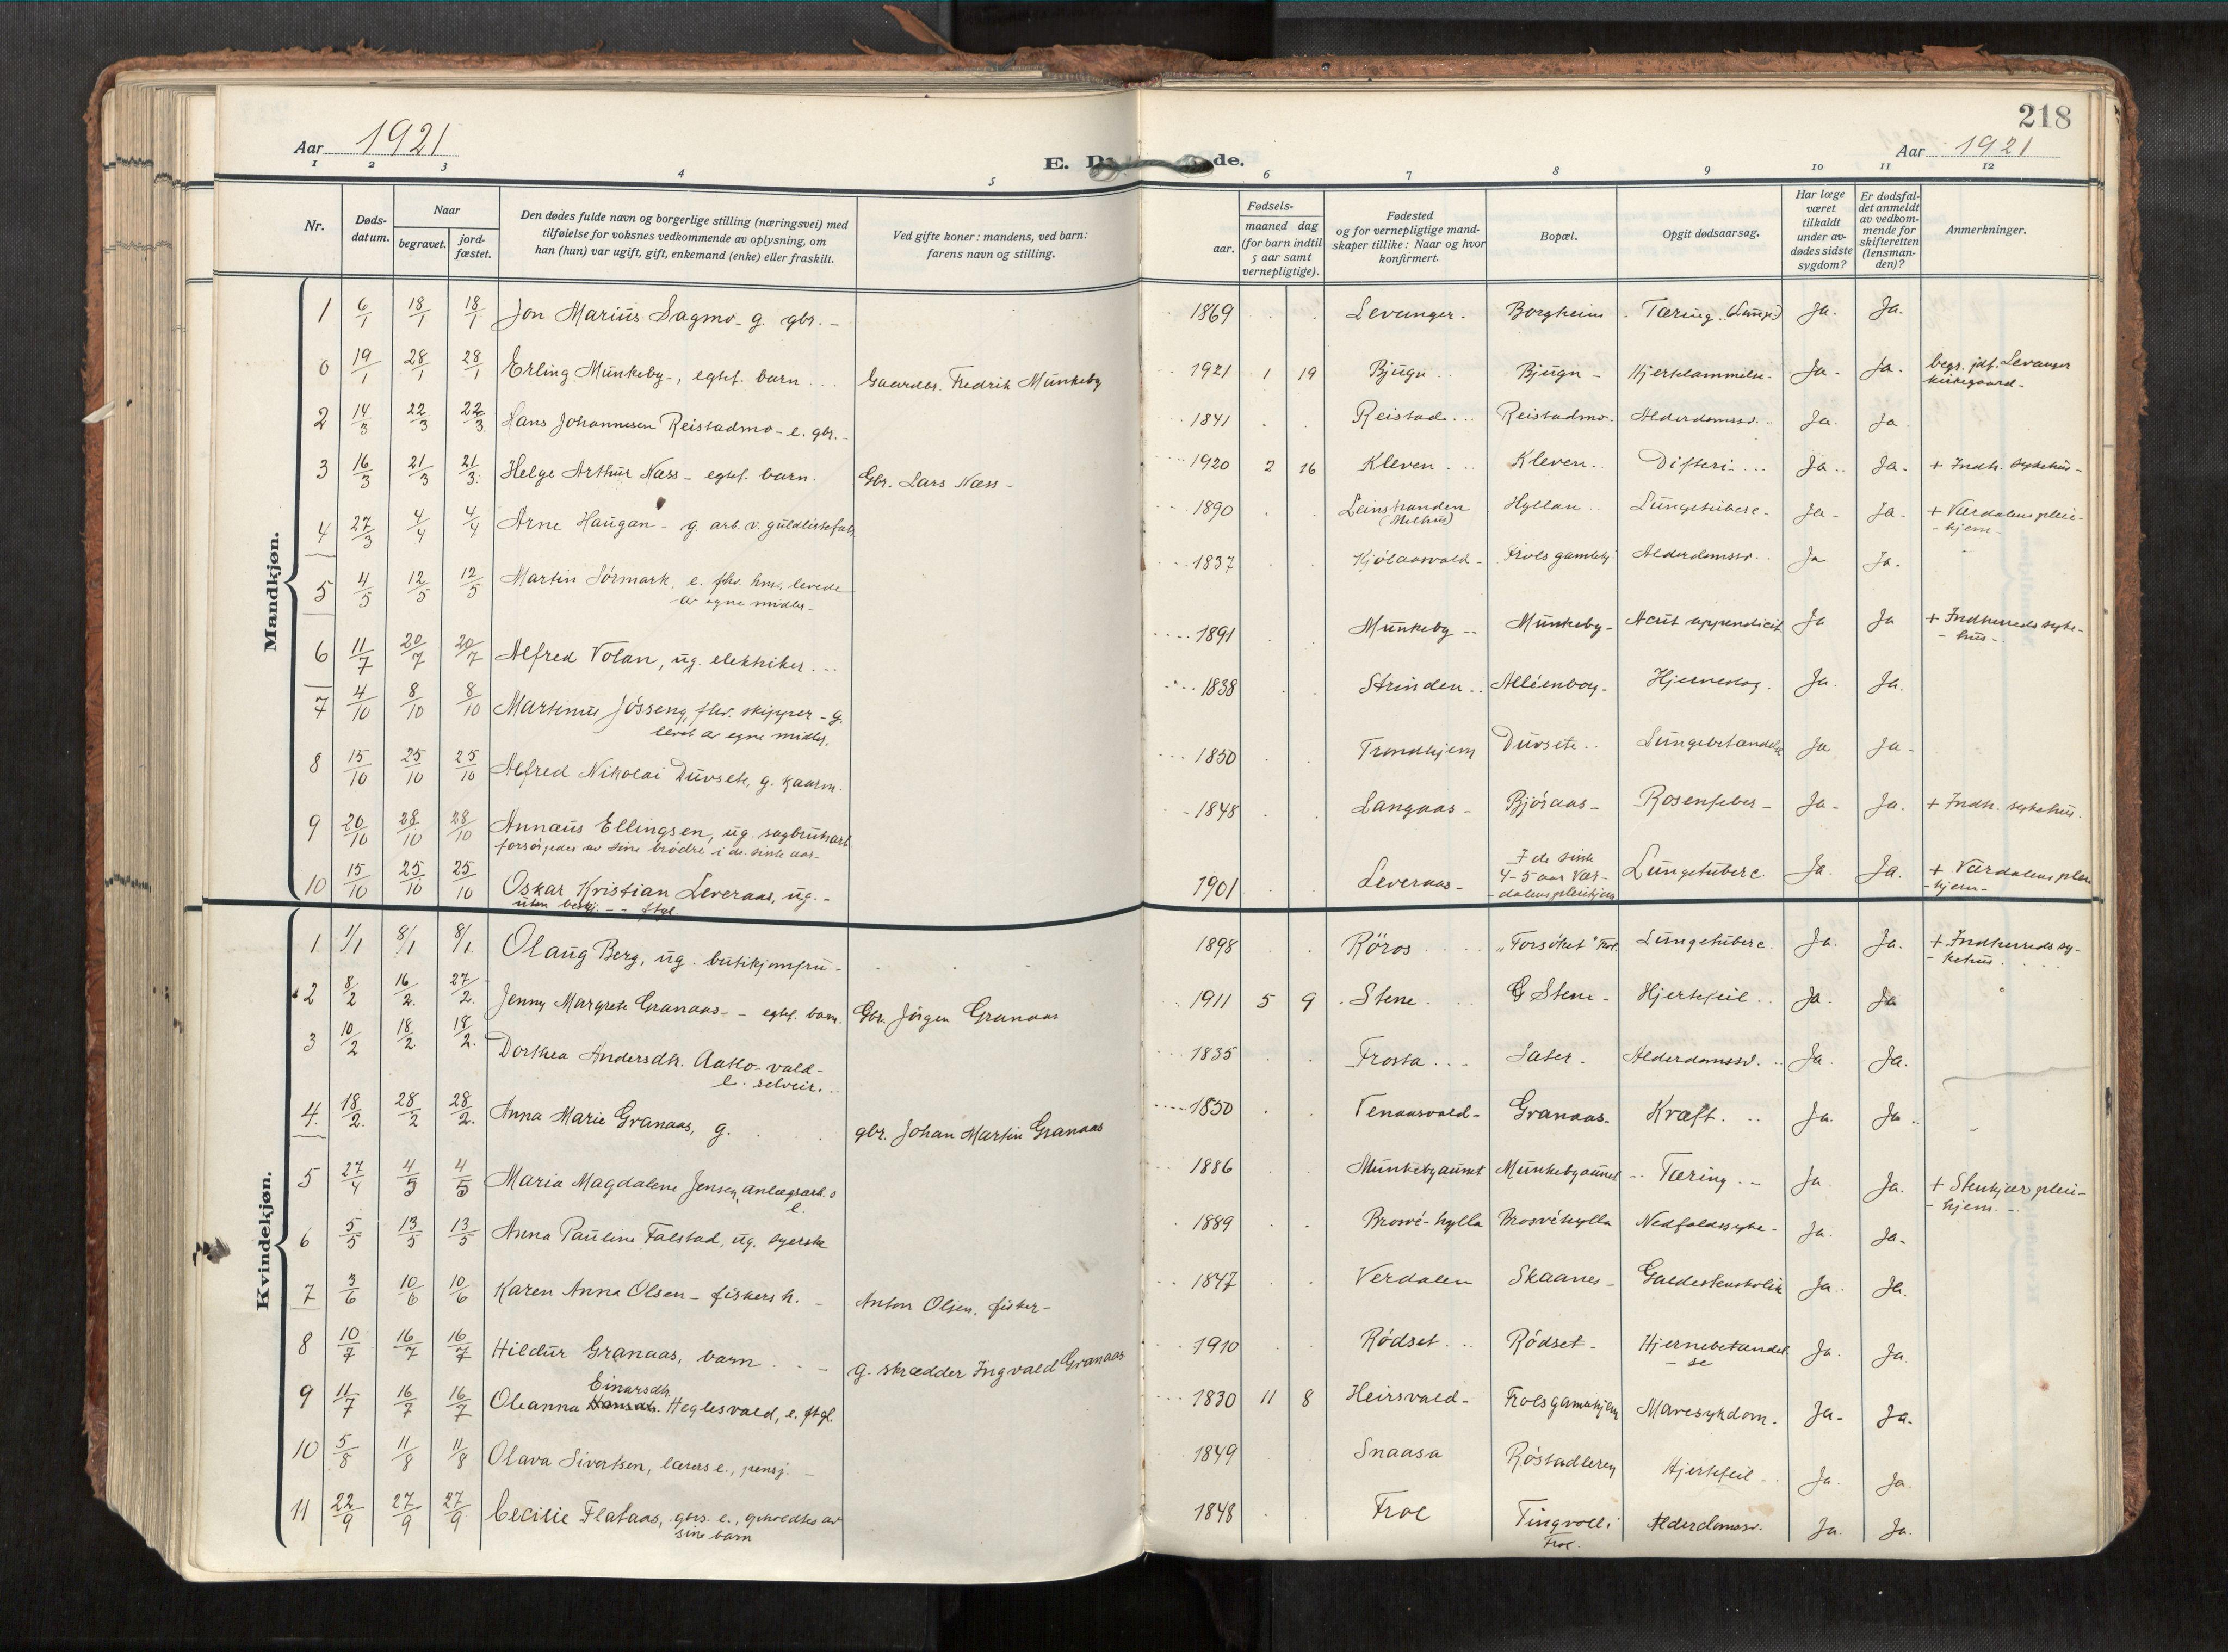 SAT, Levanger sokneprestkontor*, Parish register (official) no. 1, 1912-1935, p. 218